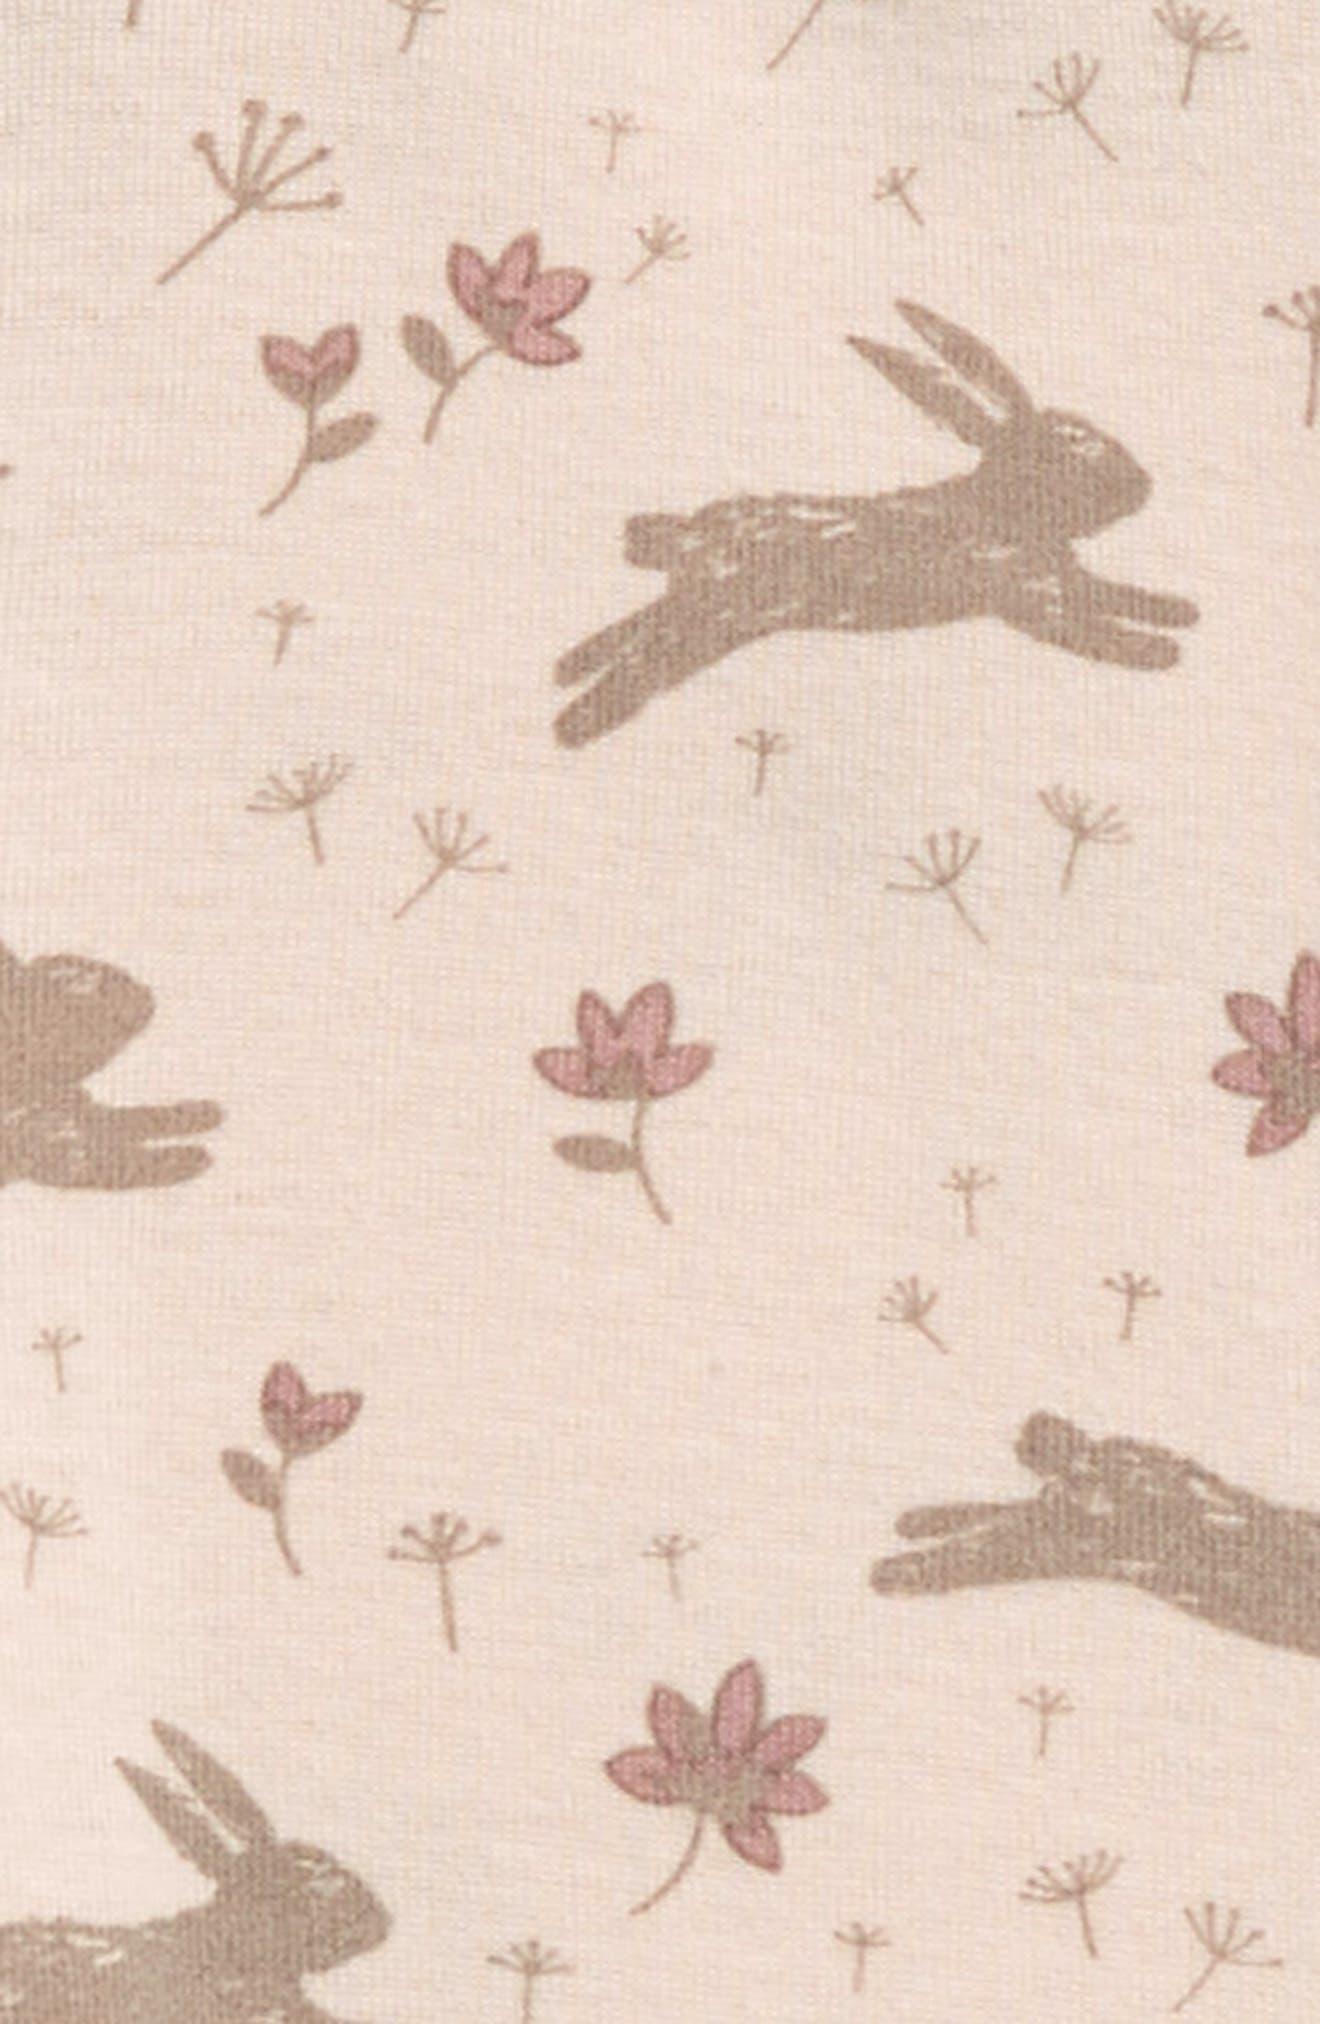 Peek Bunny Leggings,                             Alternate thumbnail 2, color,                             Light Pink